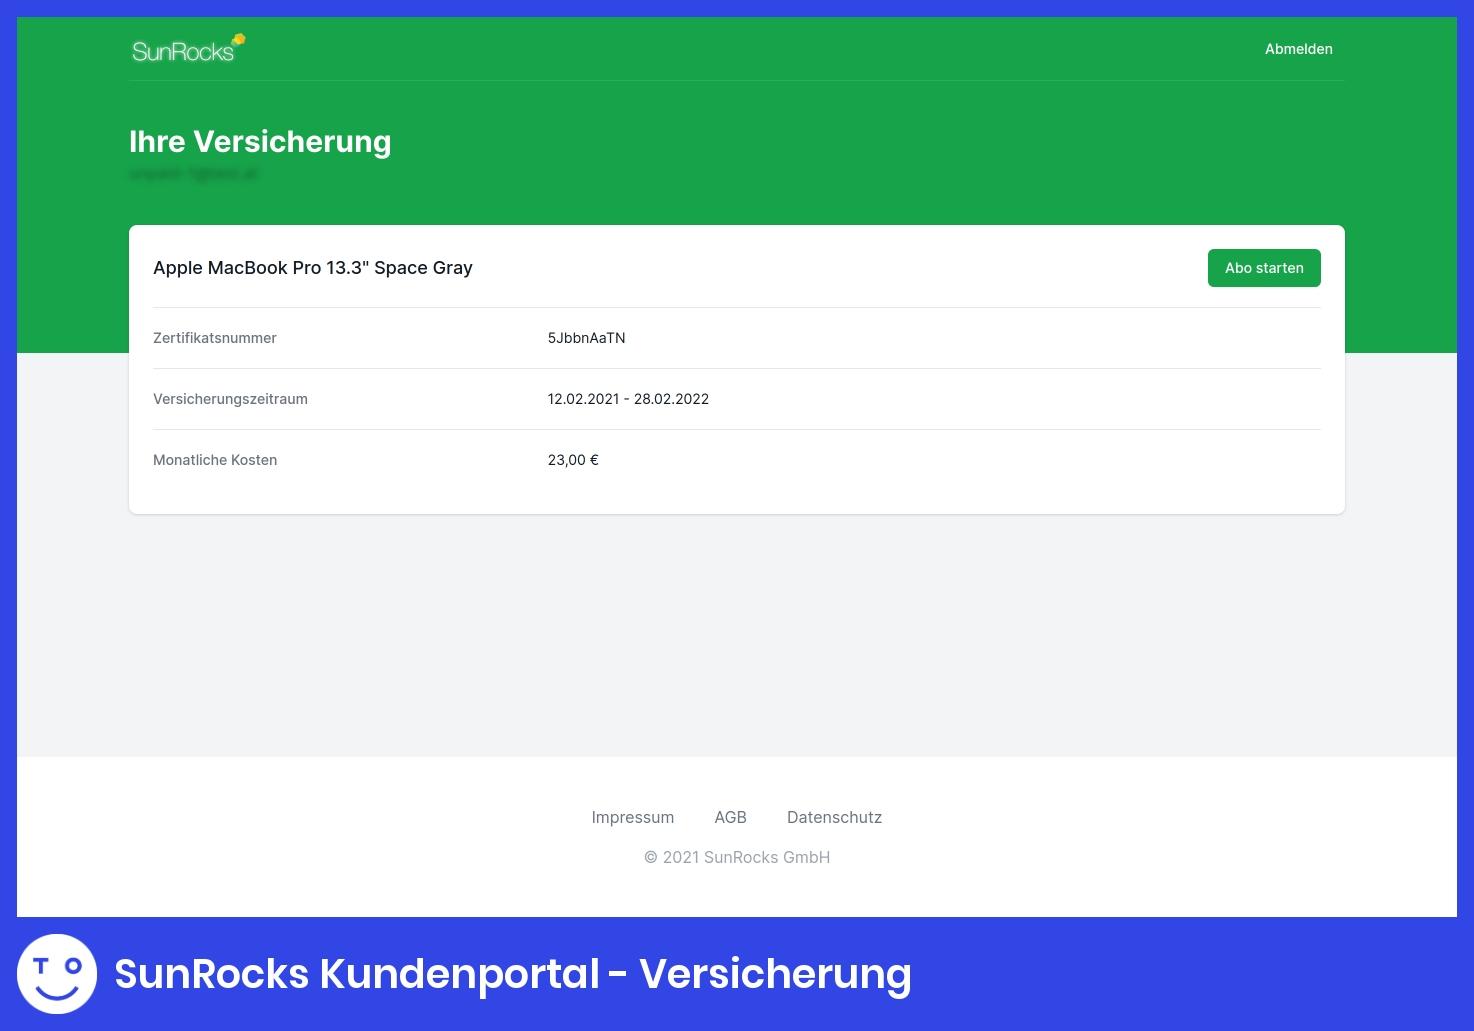 SunRocks Kundenportal - Versicherung